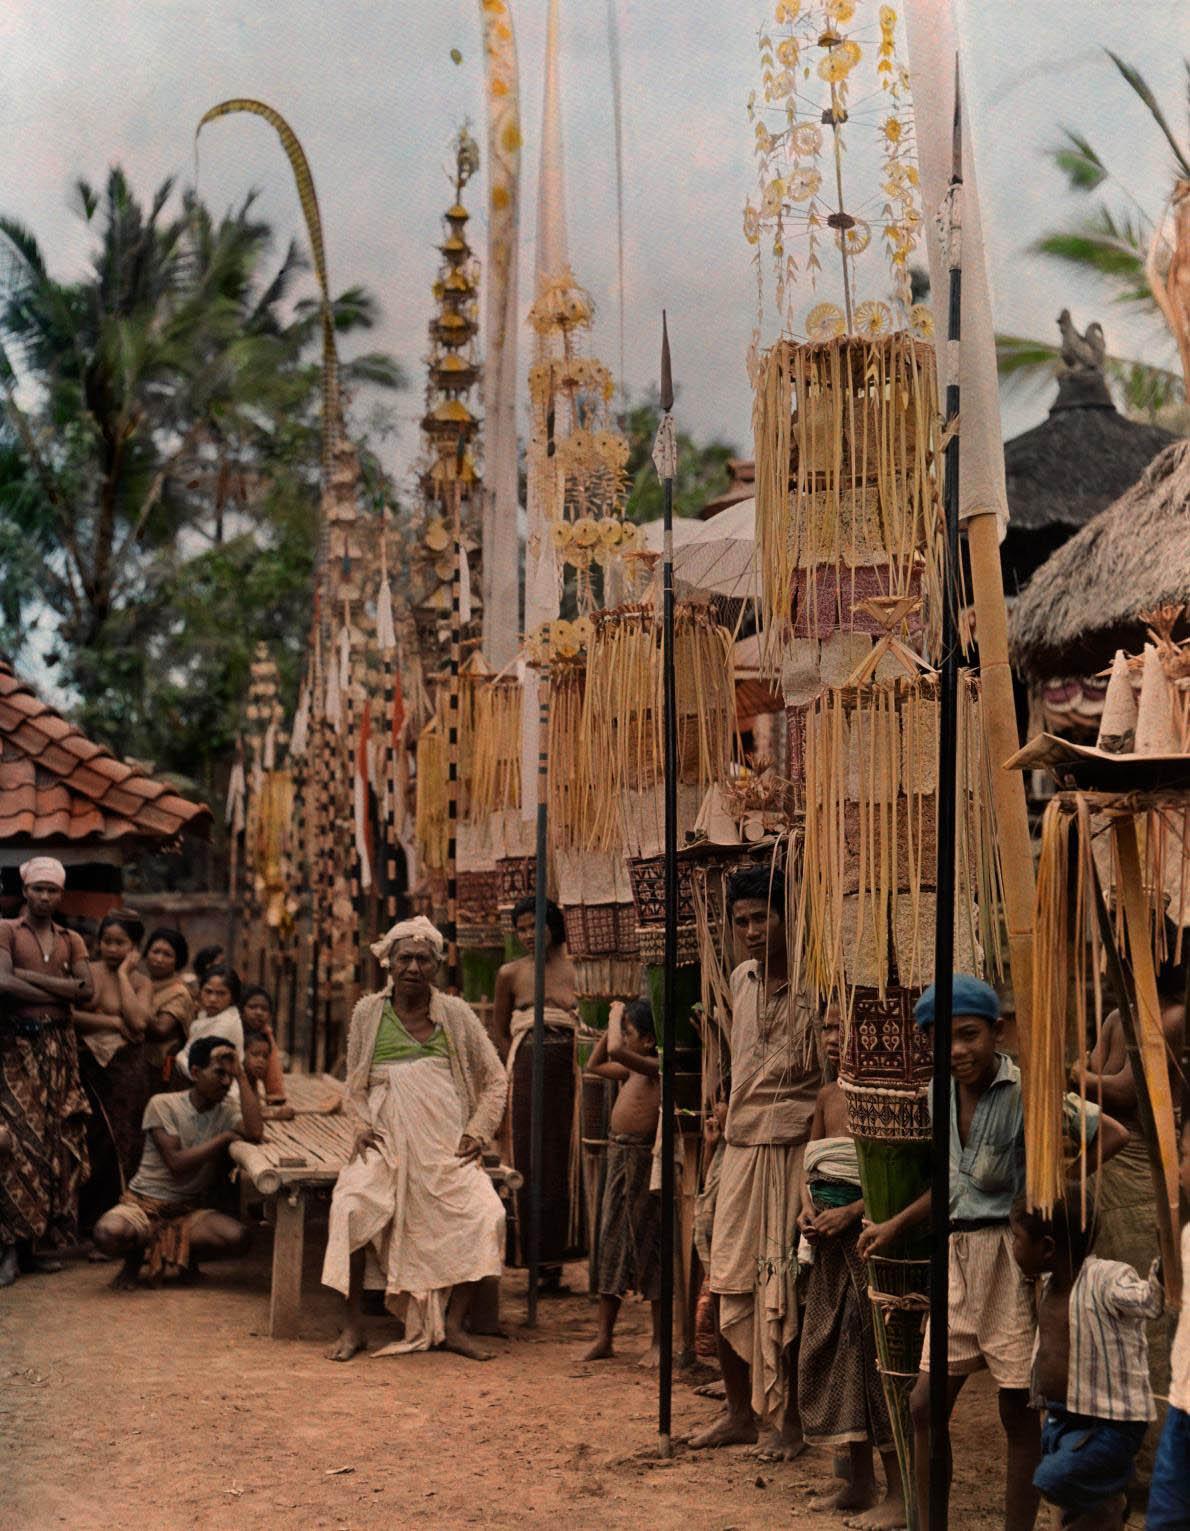 17-bali-locals-temple.adapt.1190.1.jpg